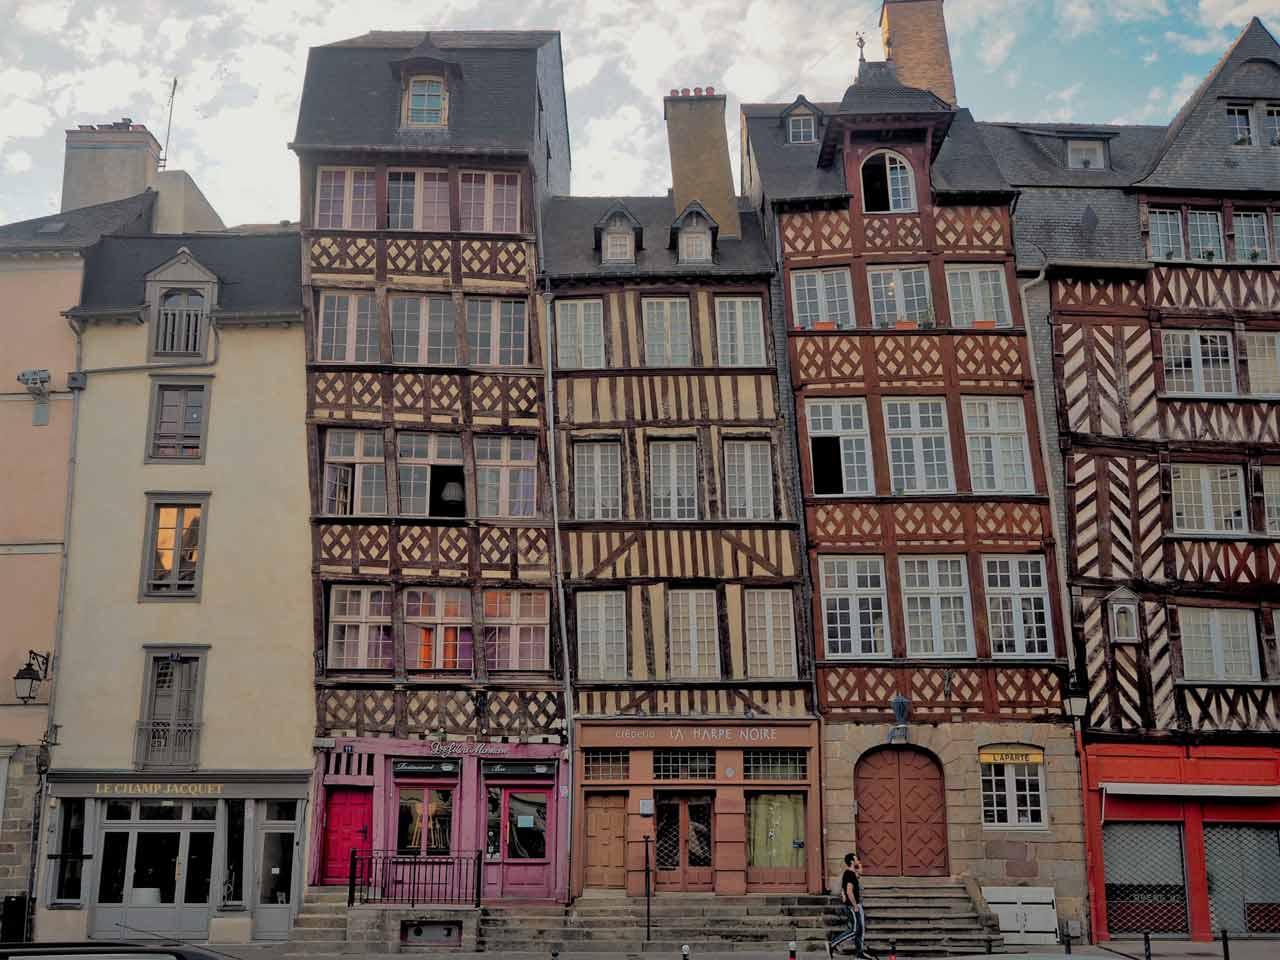 Road trip de Rennes à Biarritz